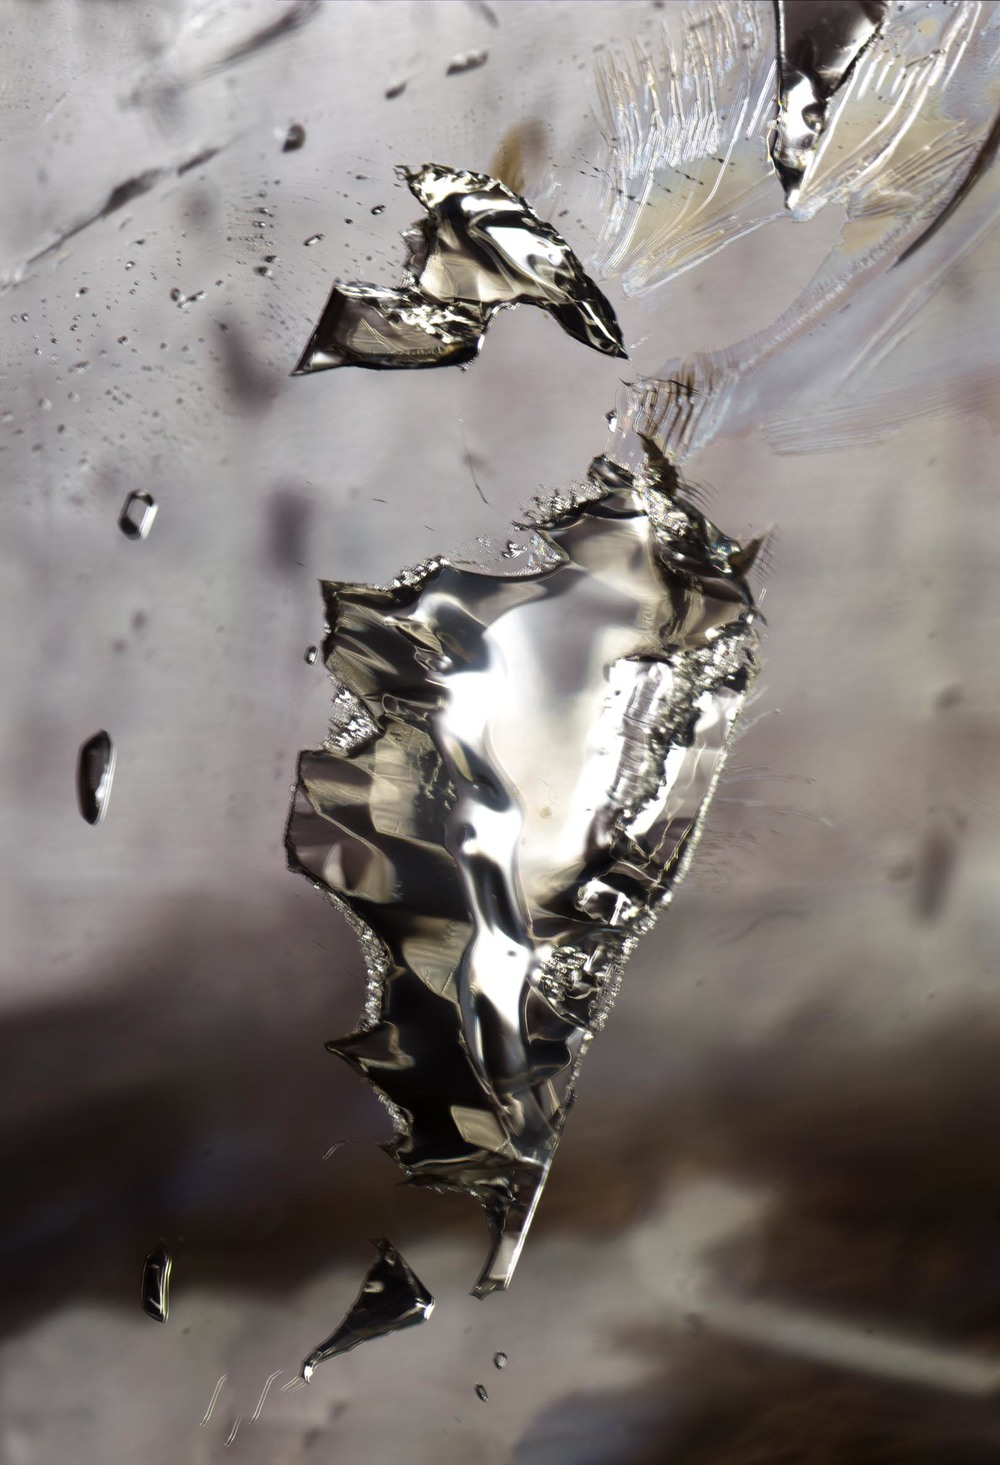 Large Image-quartz-2-dn.jpg